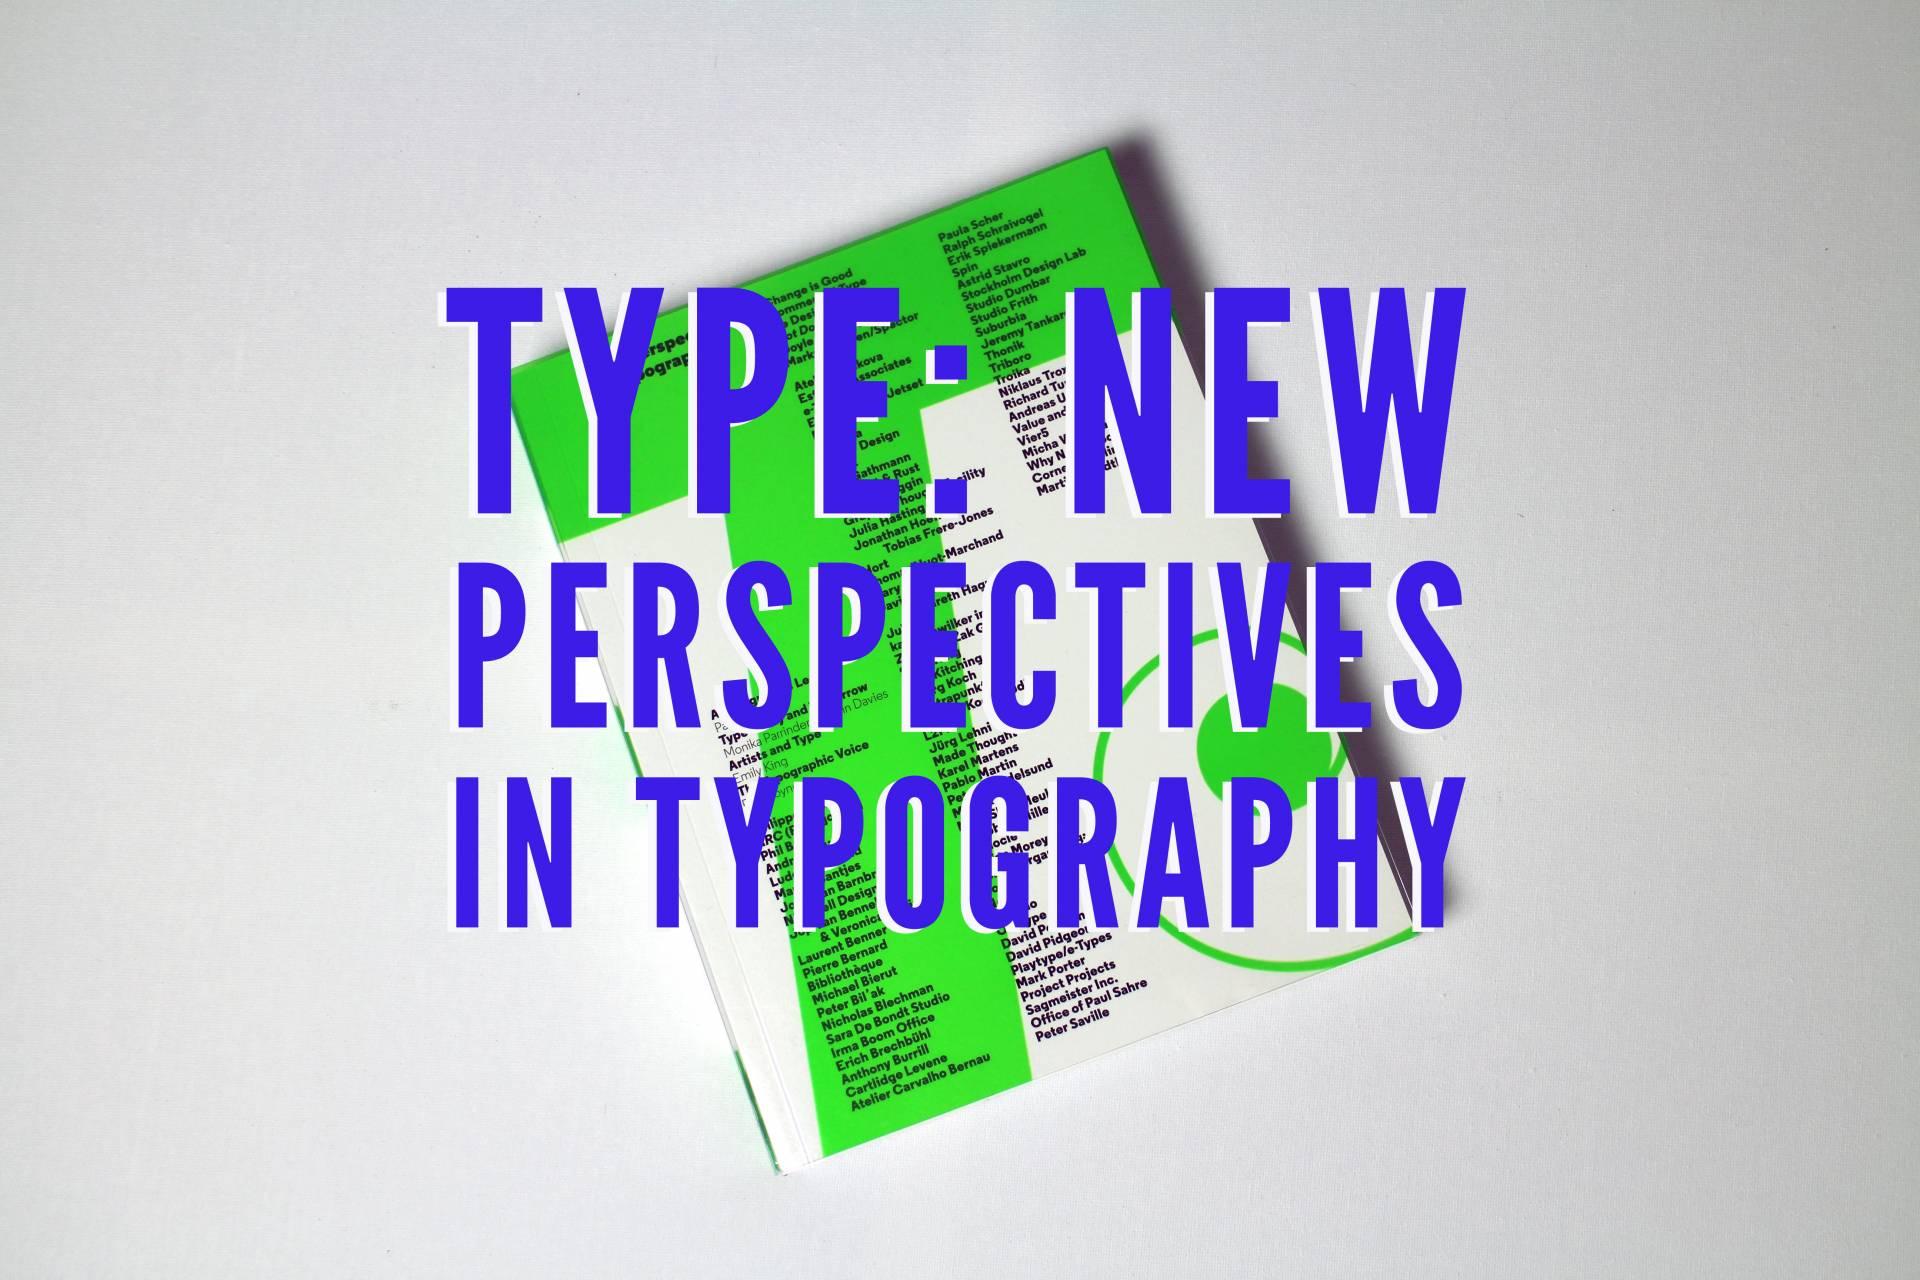 http://graphiquefantastique.com/wp-content/uploads/2015/09/TypeNewPerspectivesInTypography-copy.jpg